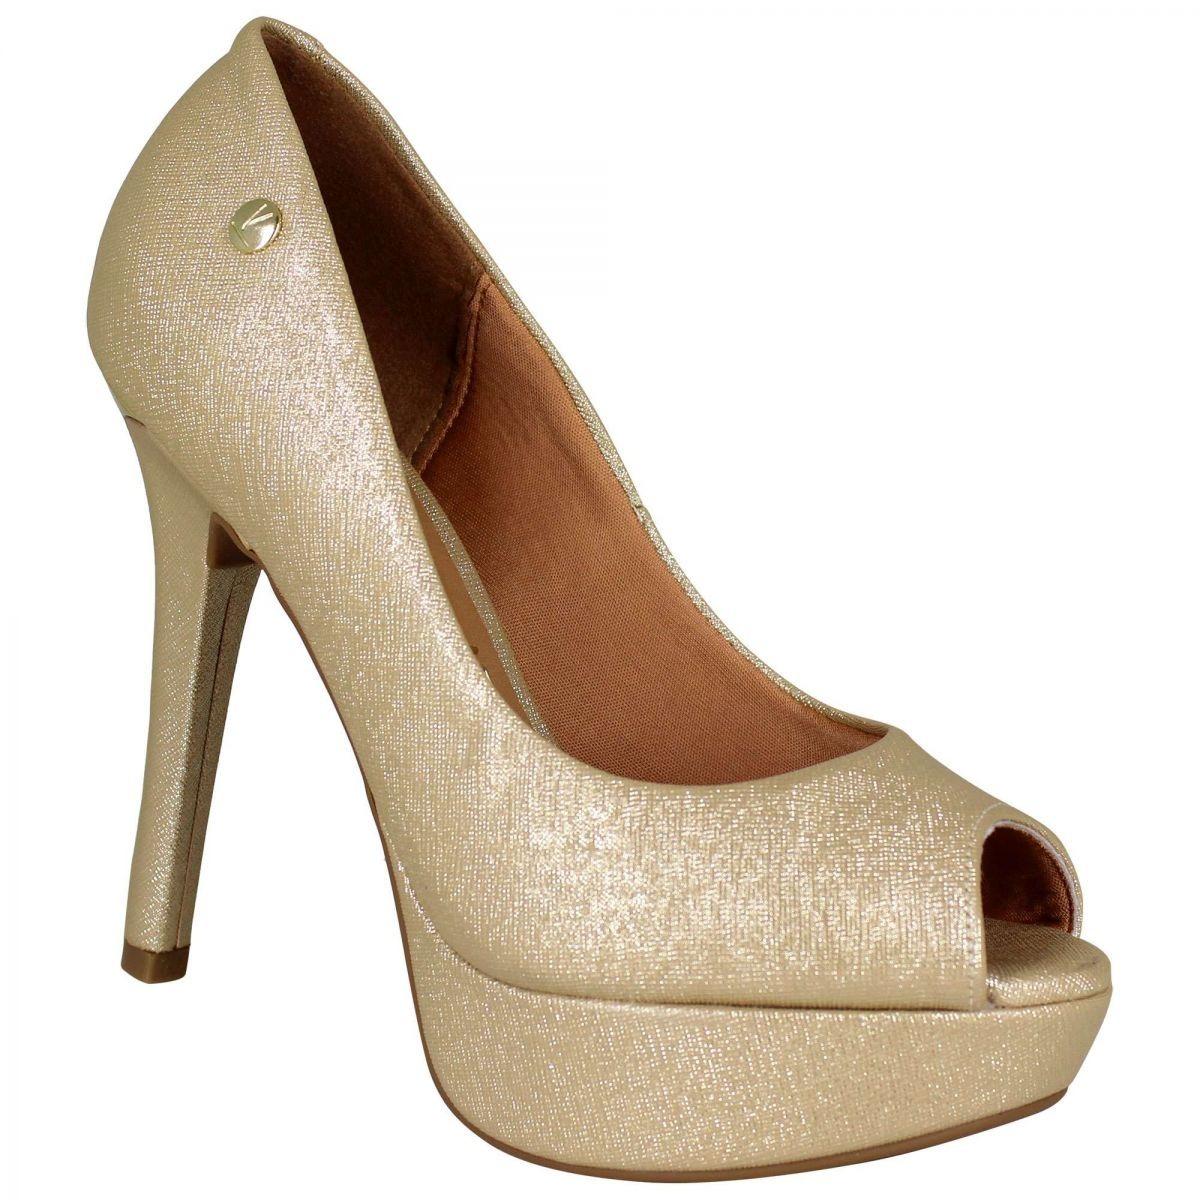 a8fb5052d sapato feminino peep toe scarpin vizzano meia pata 1830100. Carregando zoom.